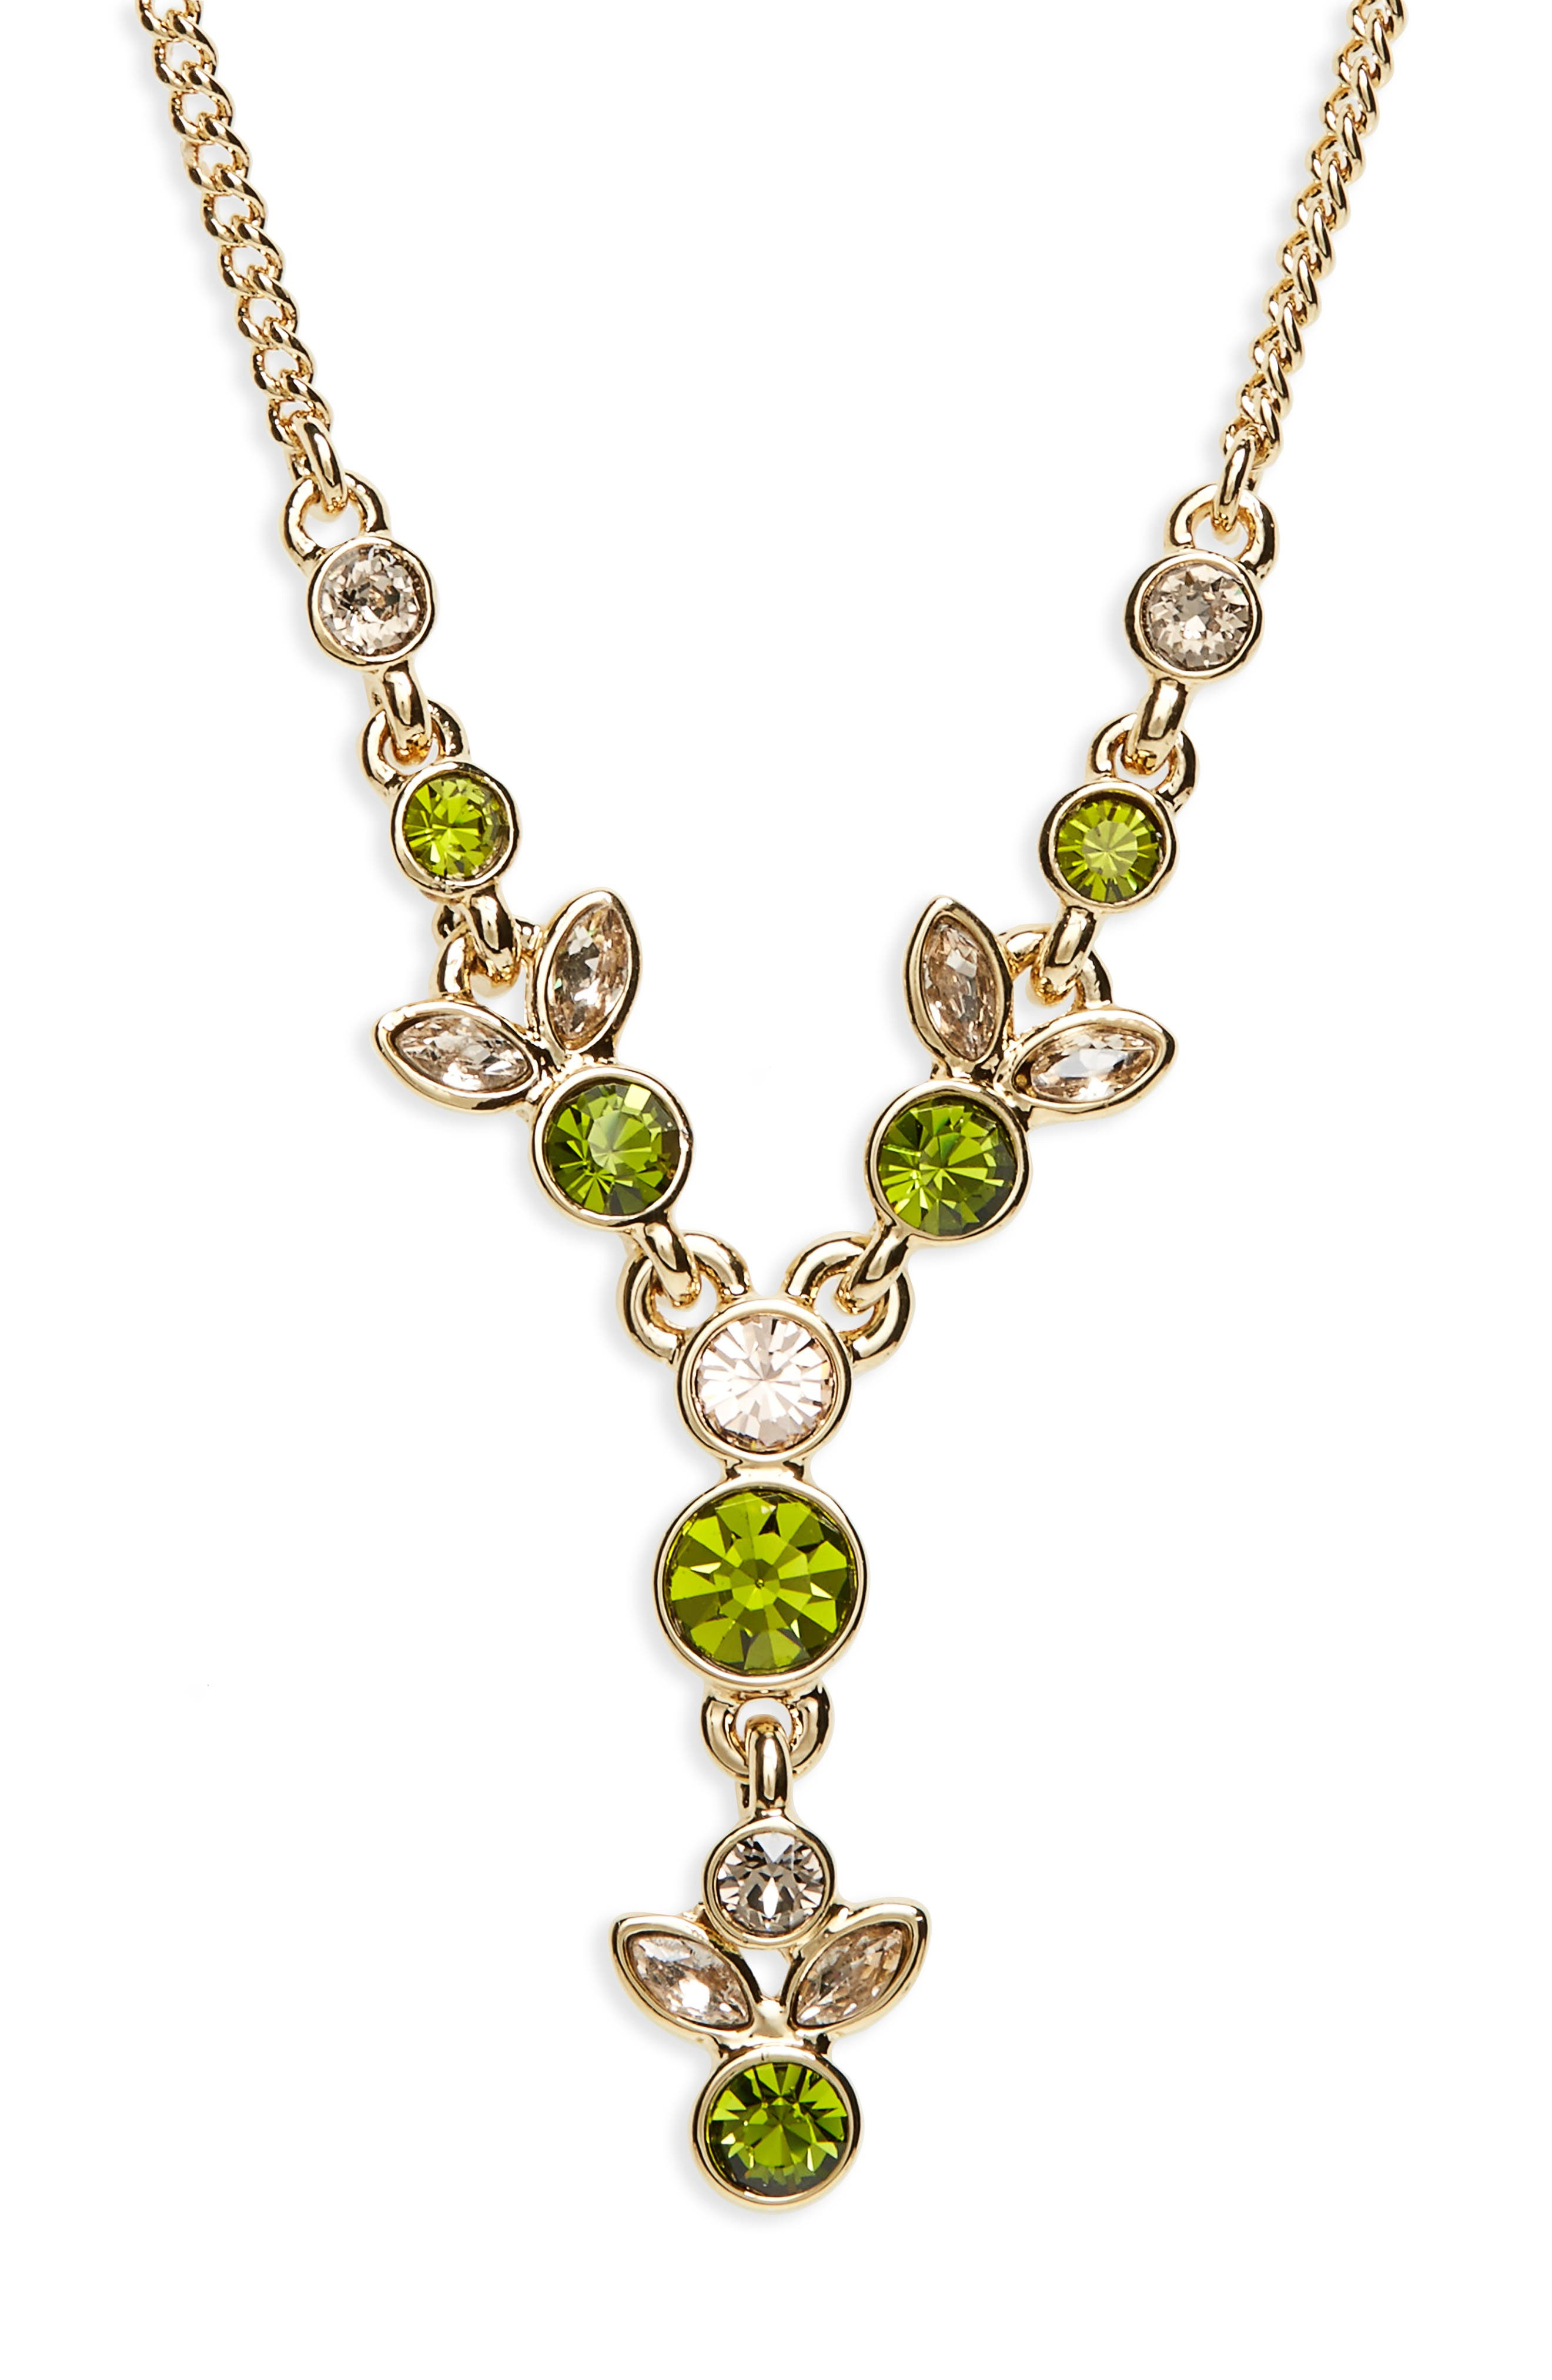 Givenchy Sydney Y-Necklace